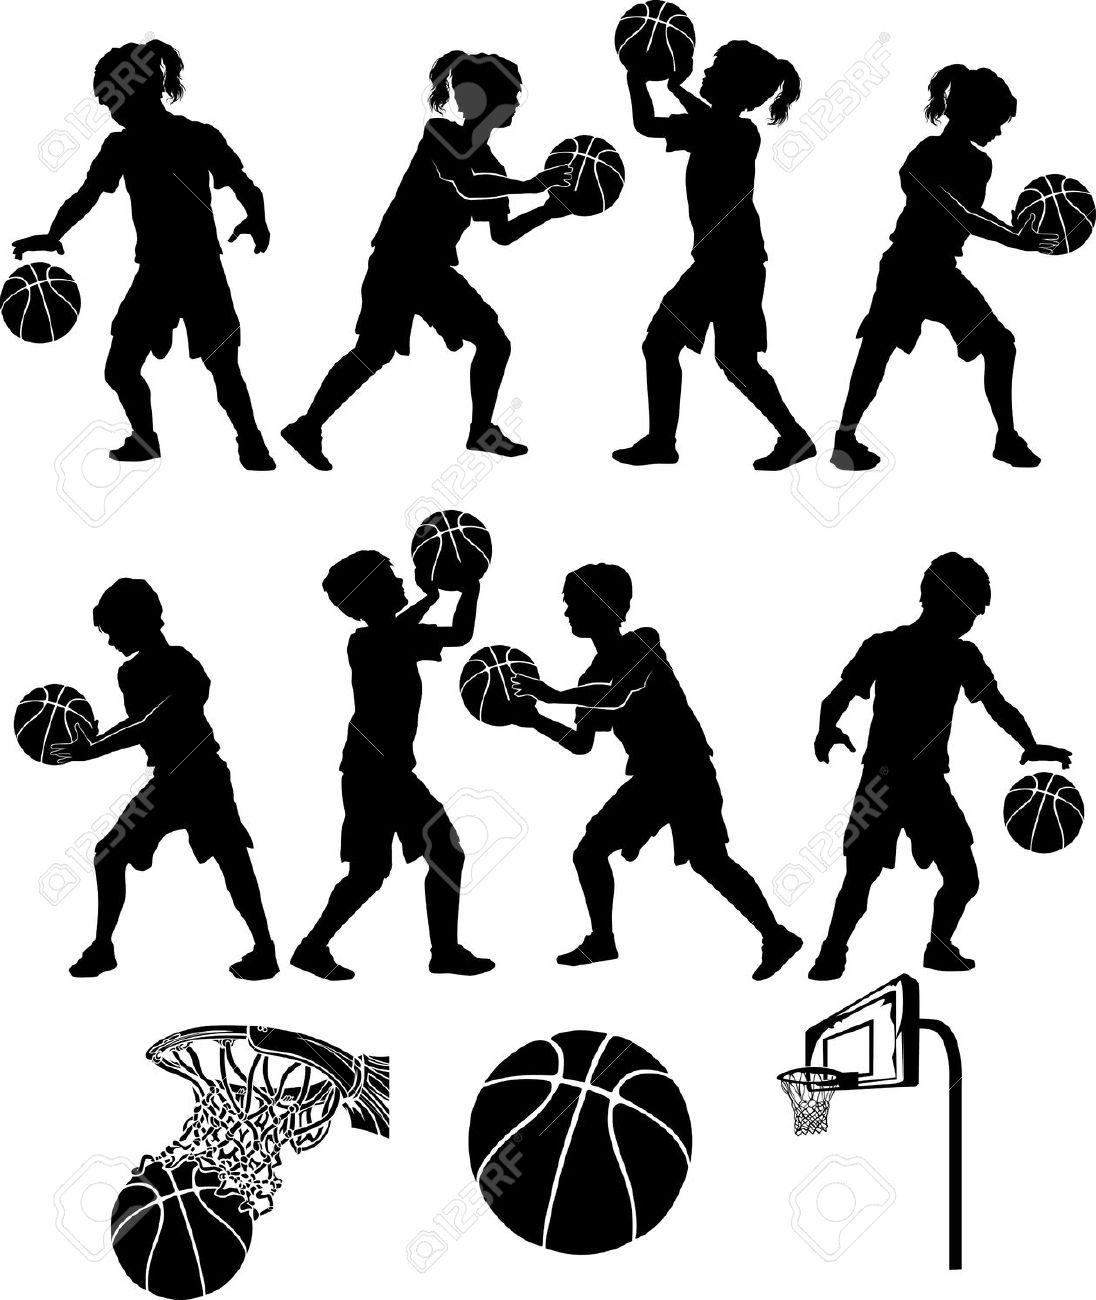 Basketball player black white drawing basketball player black white drawing